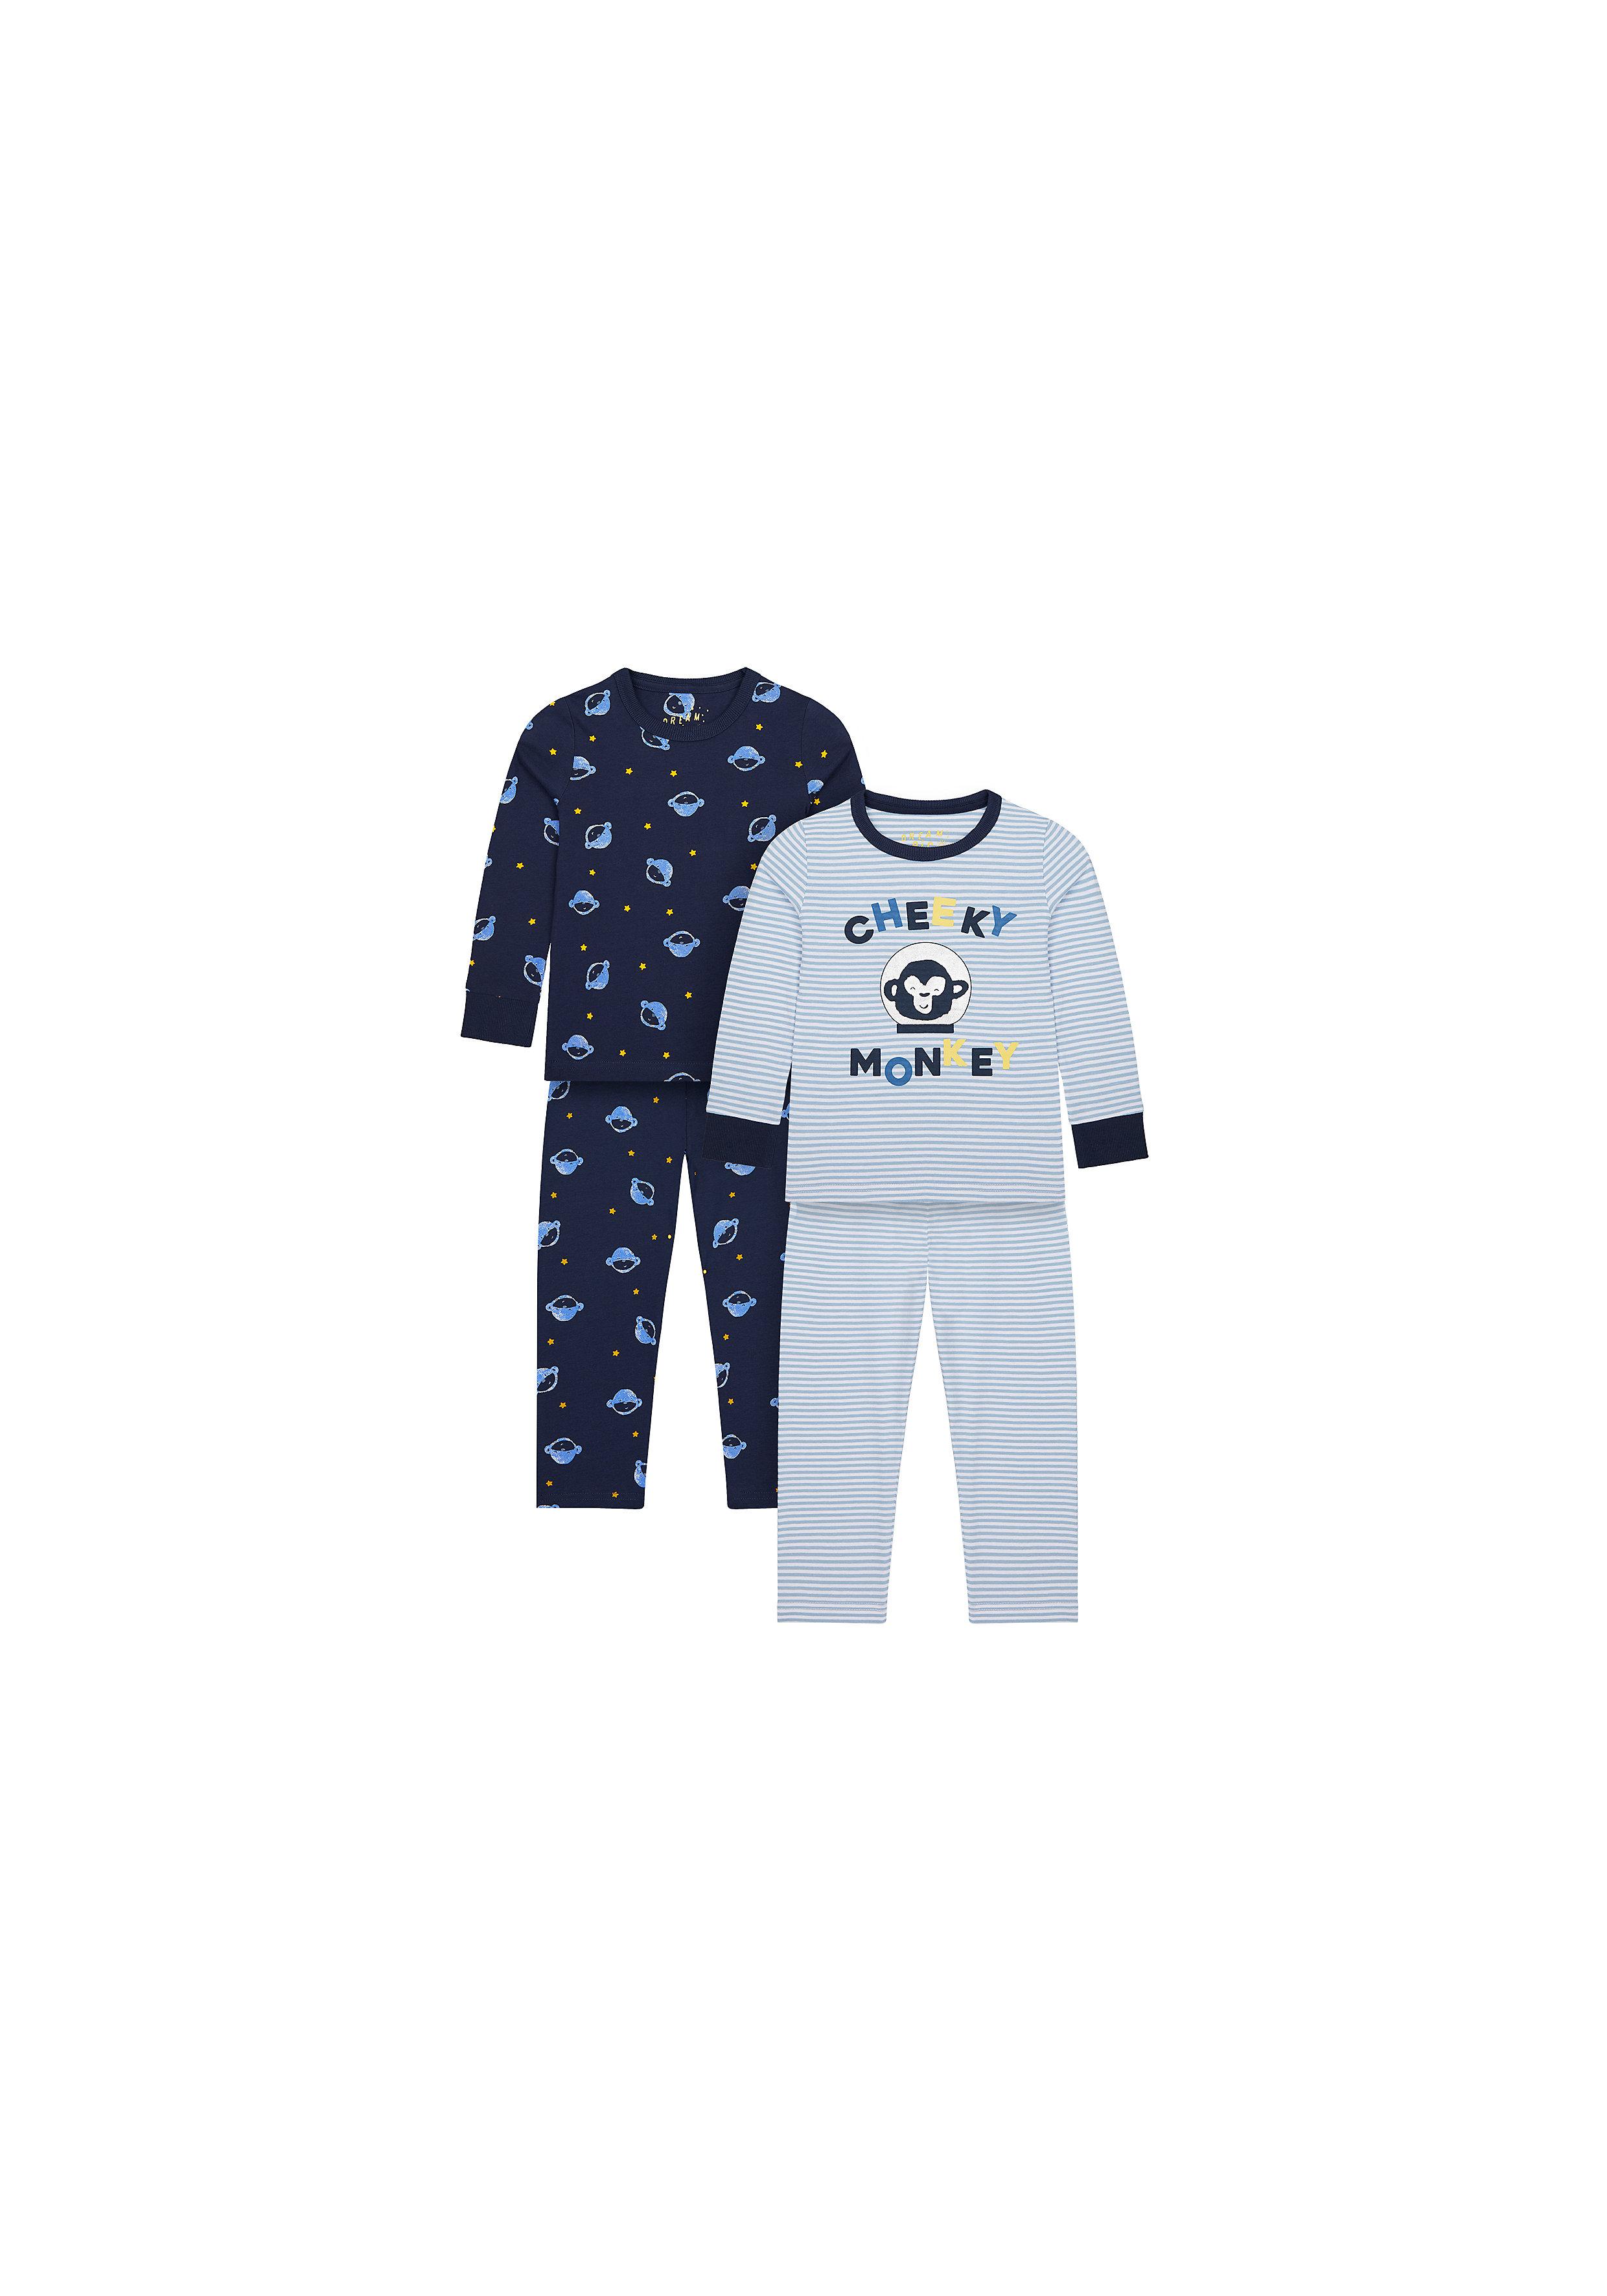 Mothercare   Boys Full Sleeves Pyjama Sets - Pack Of 2 - Blue